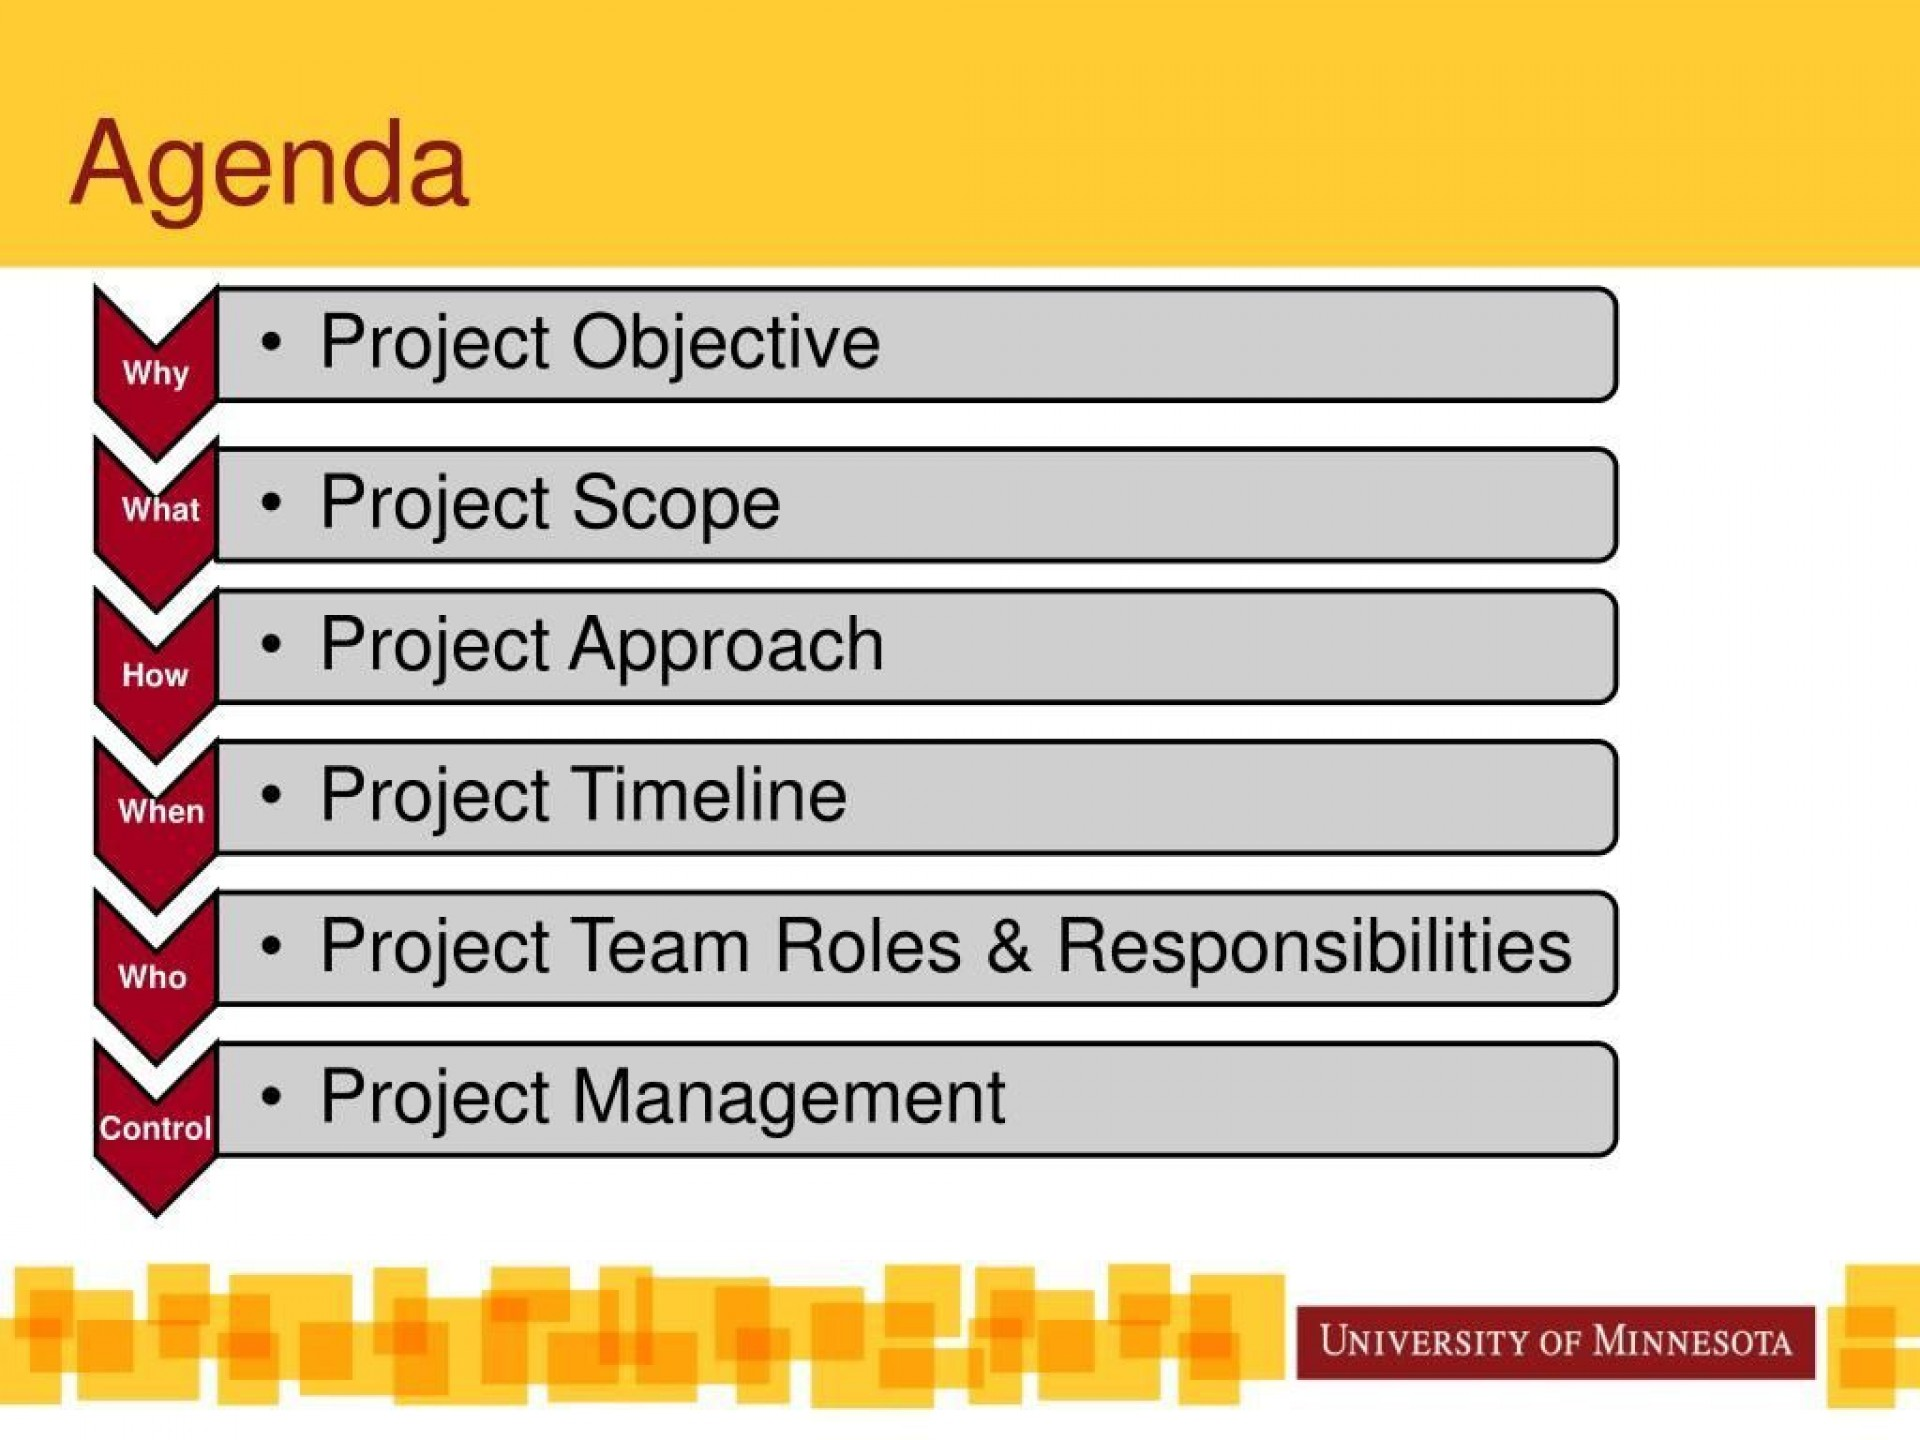 001 Beautiful Project Management Kick Off Meeting Agenda Template Image  Kickoff1920